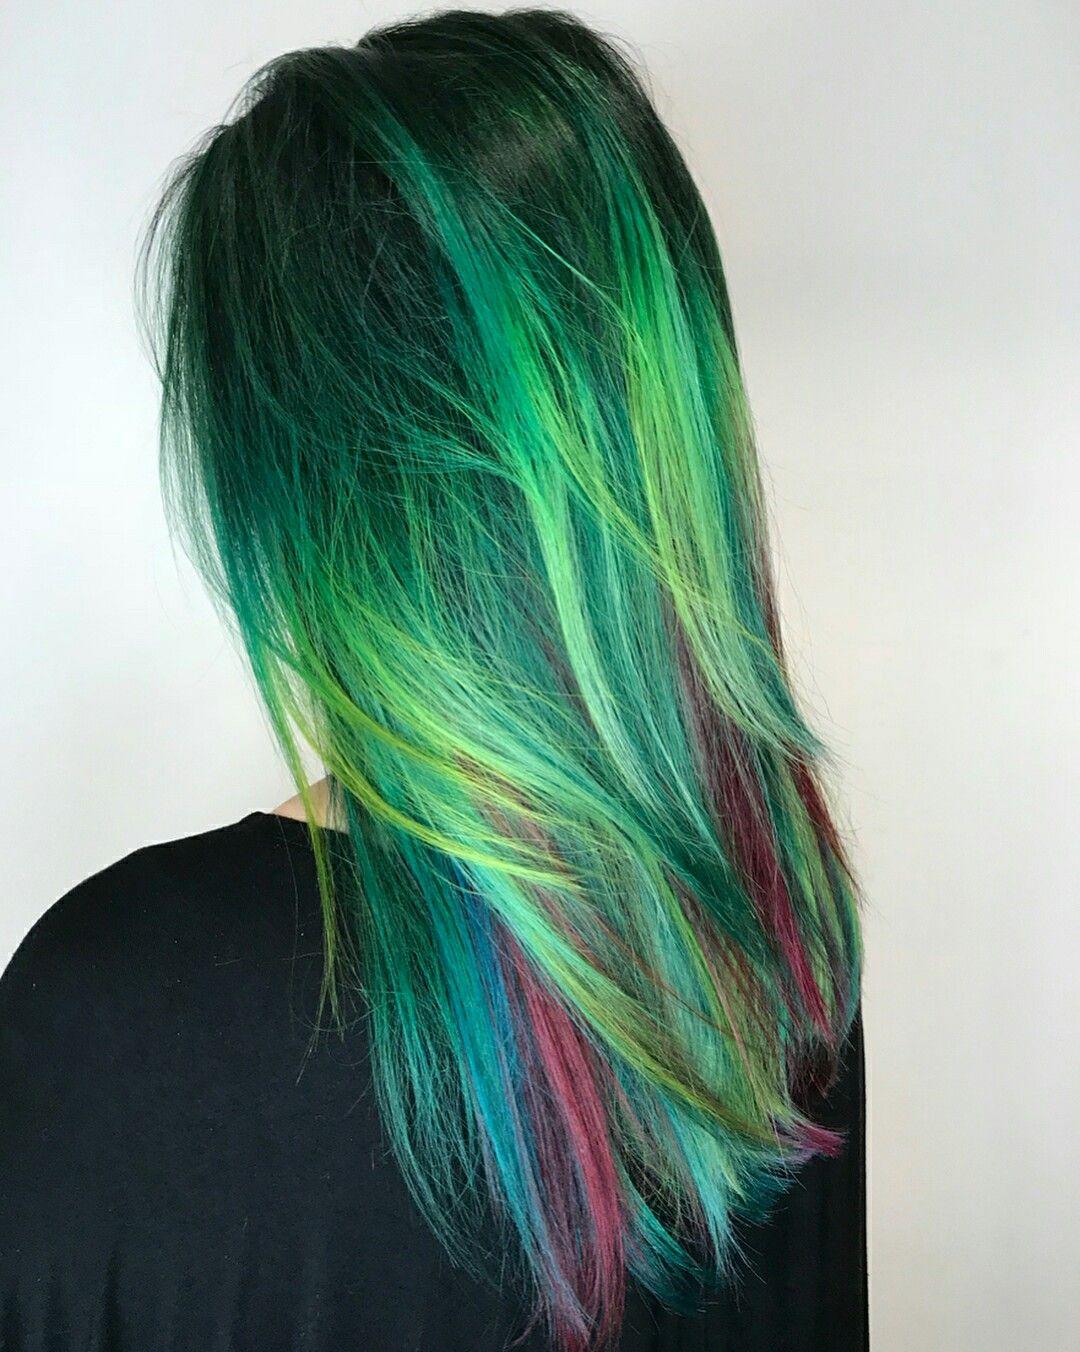 Pin by Elena Rdz on Hair colors  Pinterest  Hair coloring Hair